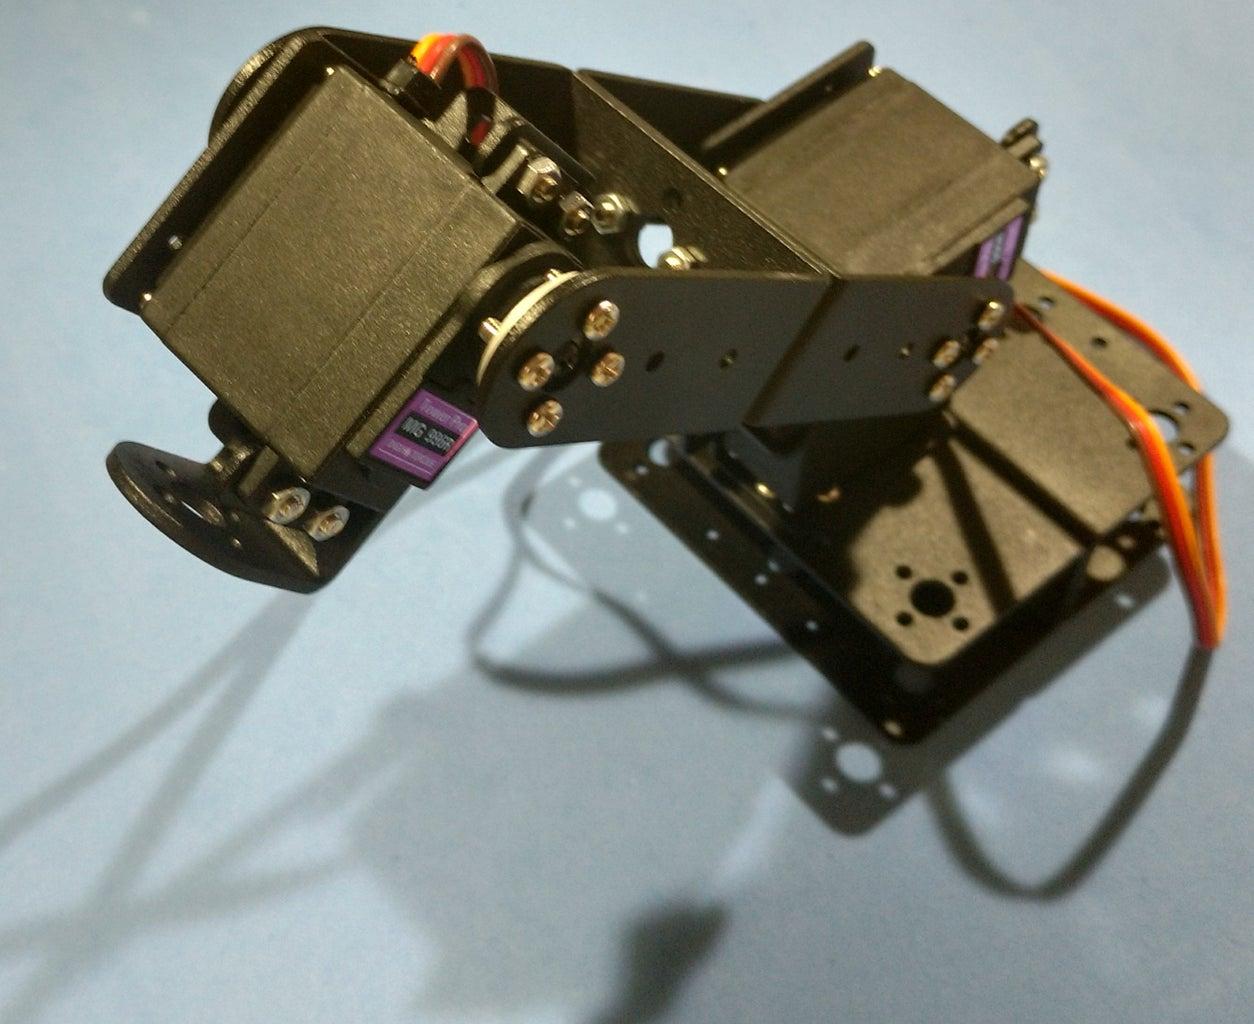 Assembling the Robotic Arm Pt4 - Servo #3